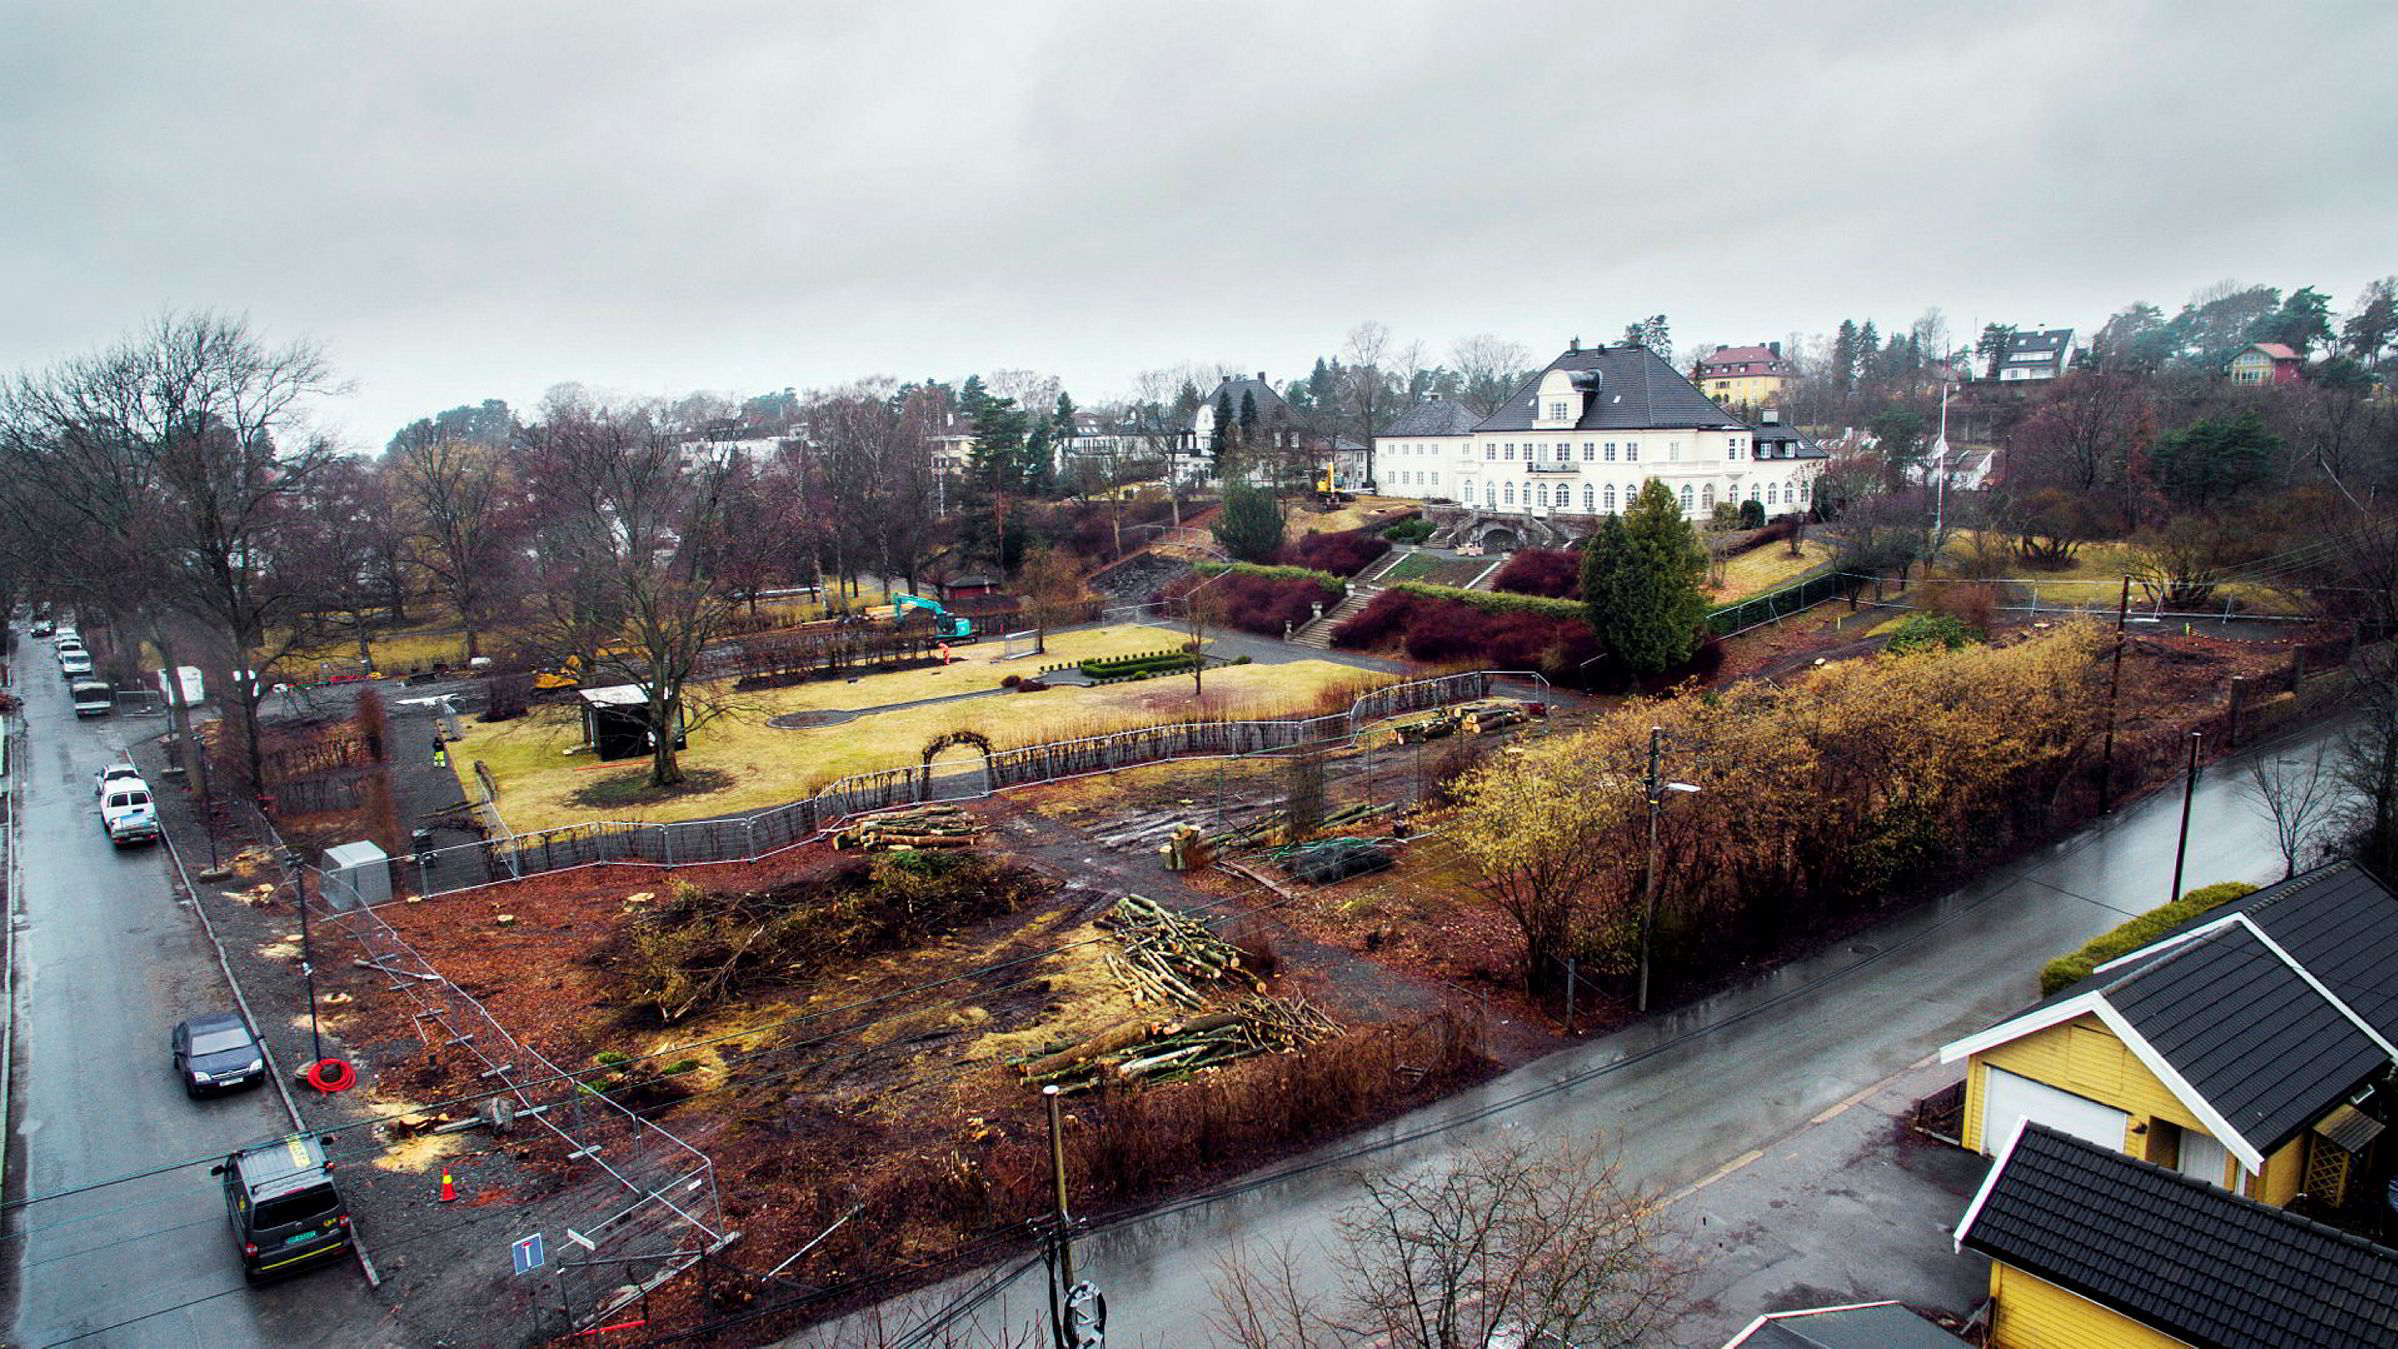 Eiendomsinvestor Tore Eiklid kjøpte hele tomten på Bygdøy i Oslo for 68 millioner kroner i 2014. To år senere solgte han halvparten for rundt 130 millioner kroner. Han har selv beholdt hovedhuset. Rundt parken skal det bygges boliger.